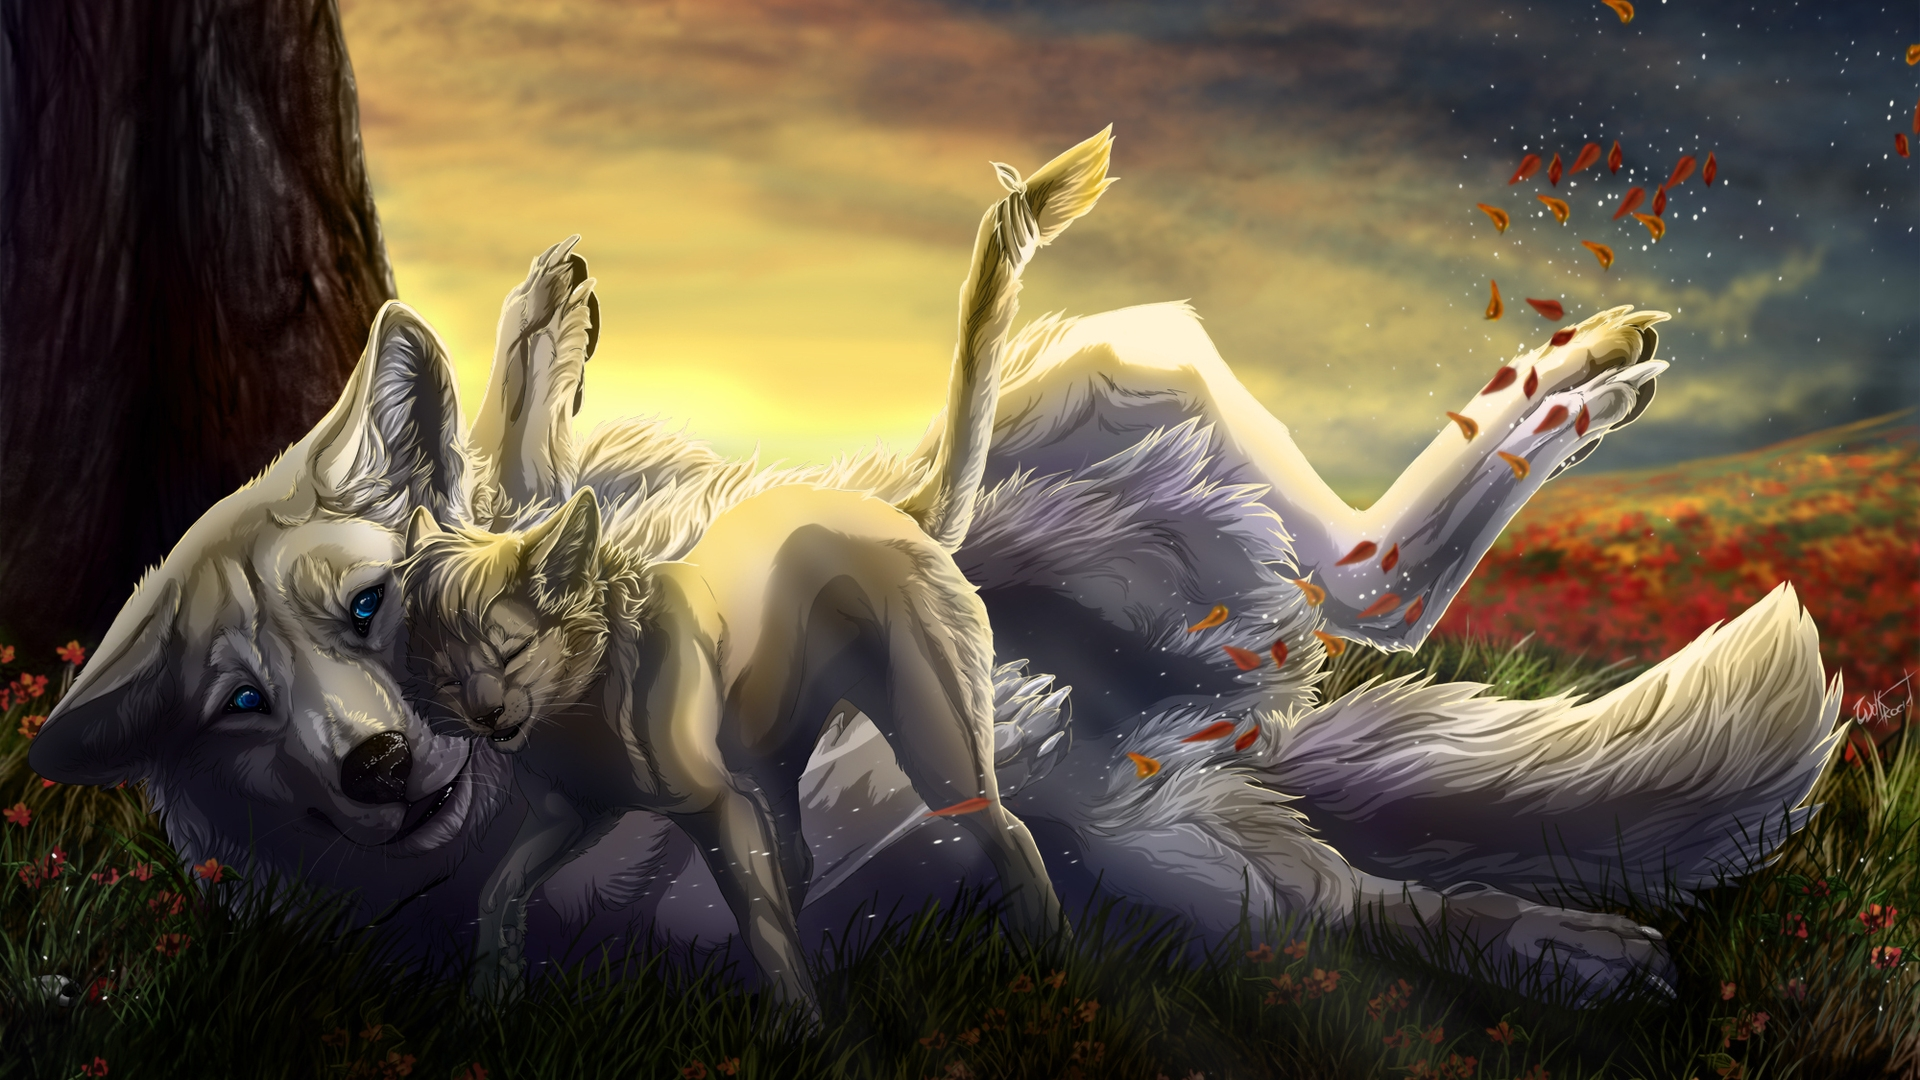 Cool Anime Wolf Wallpapers - WallpaperSafari